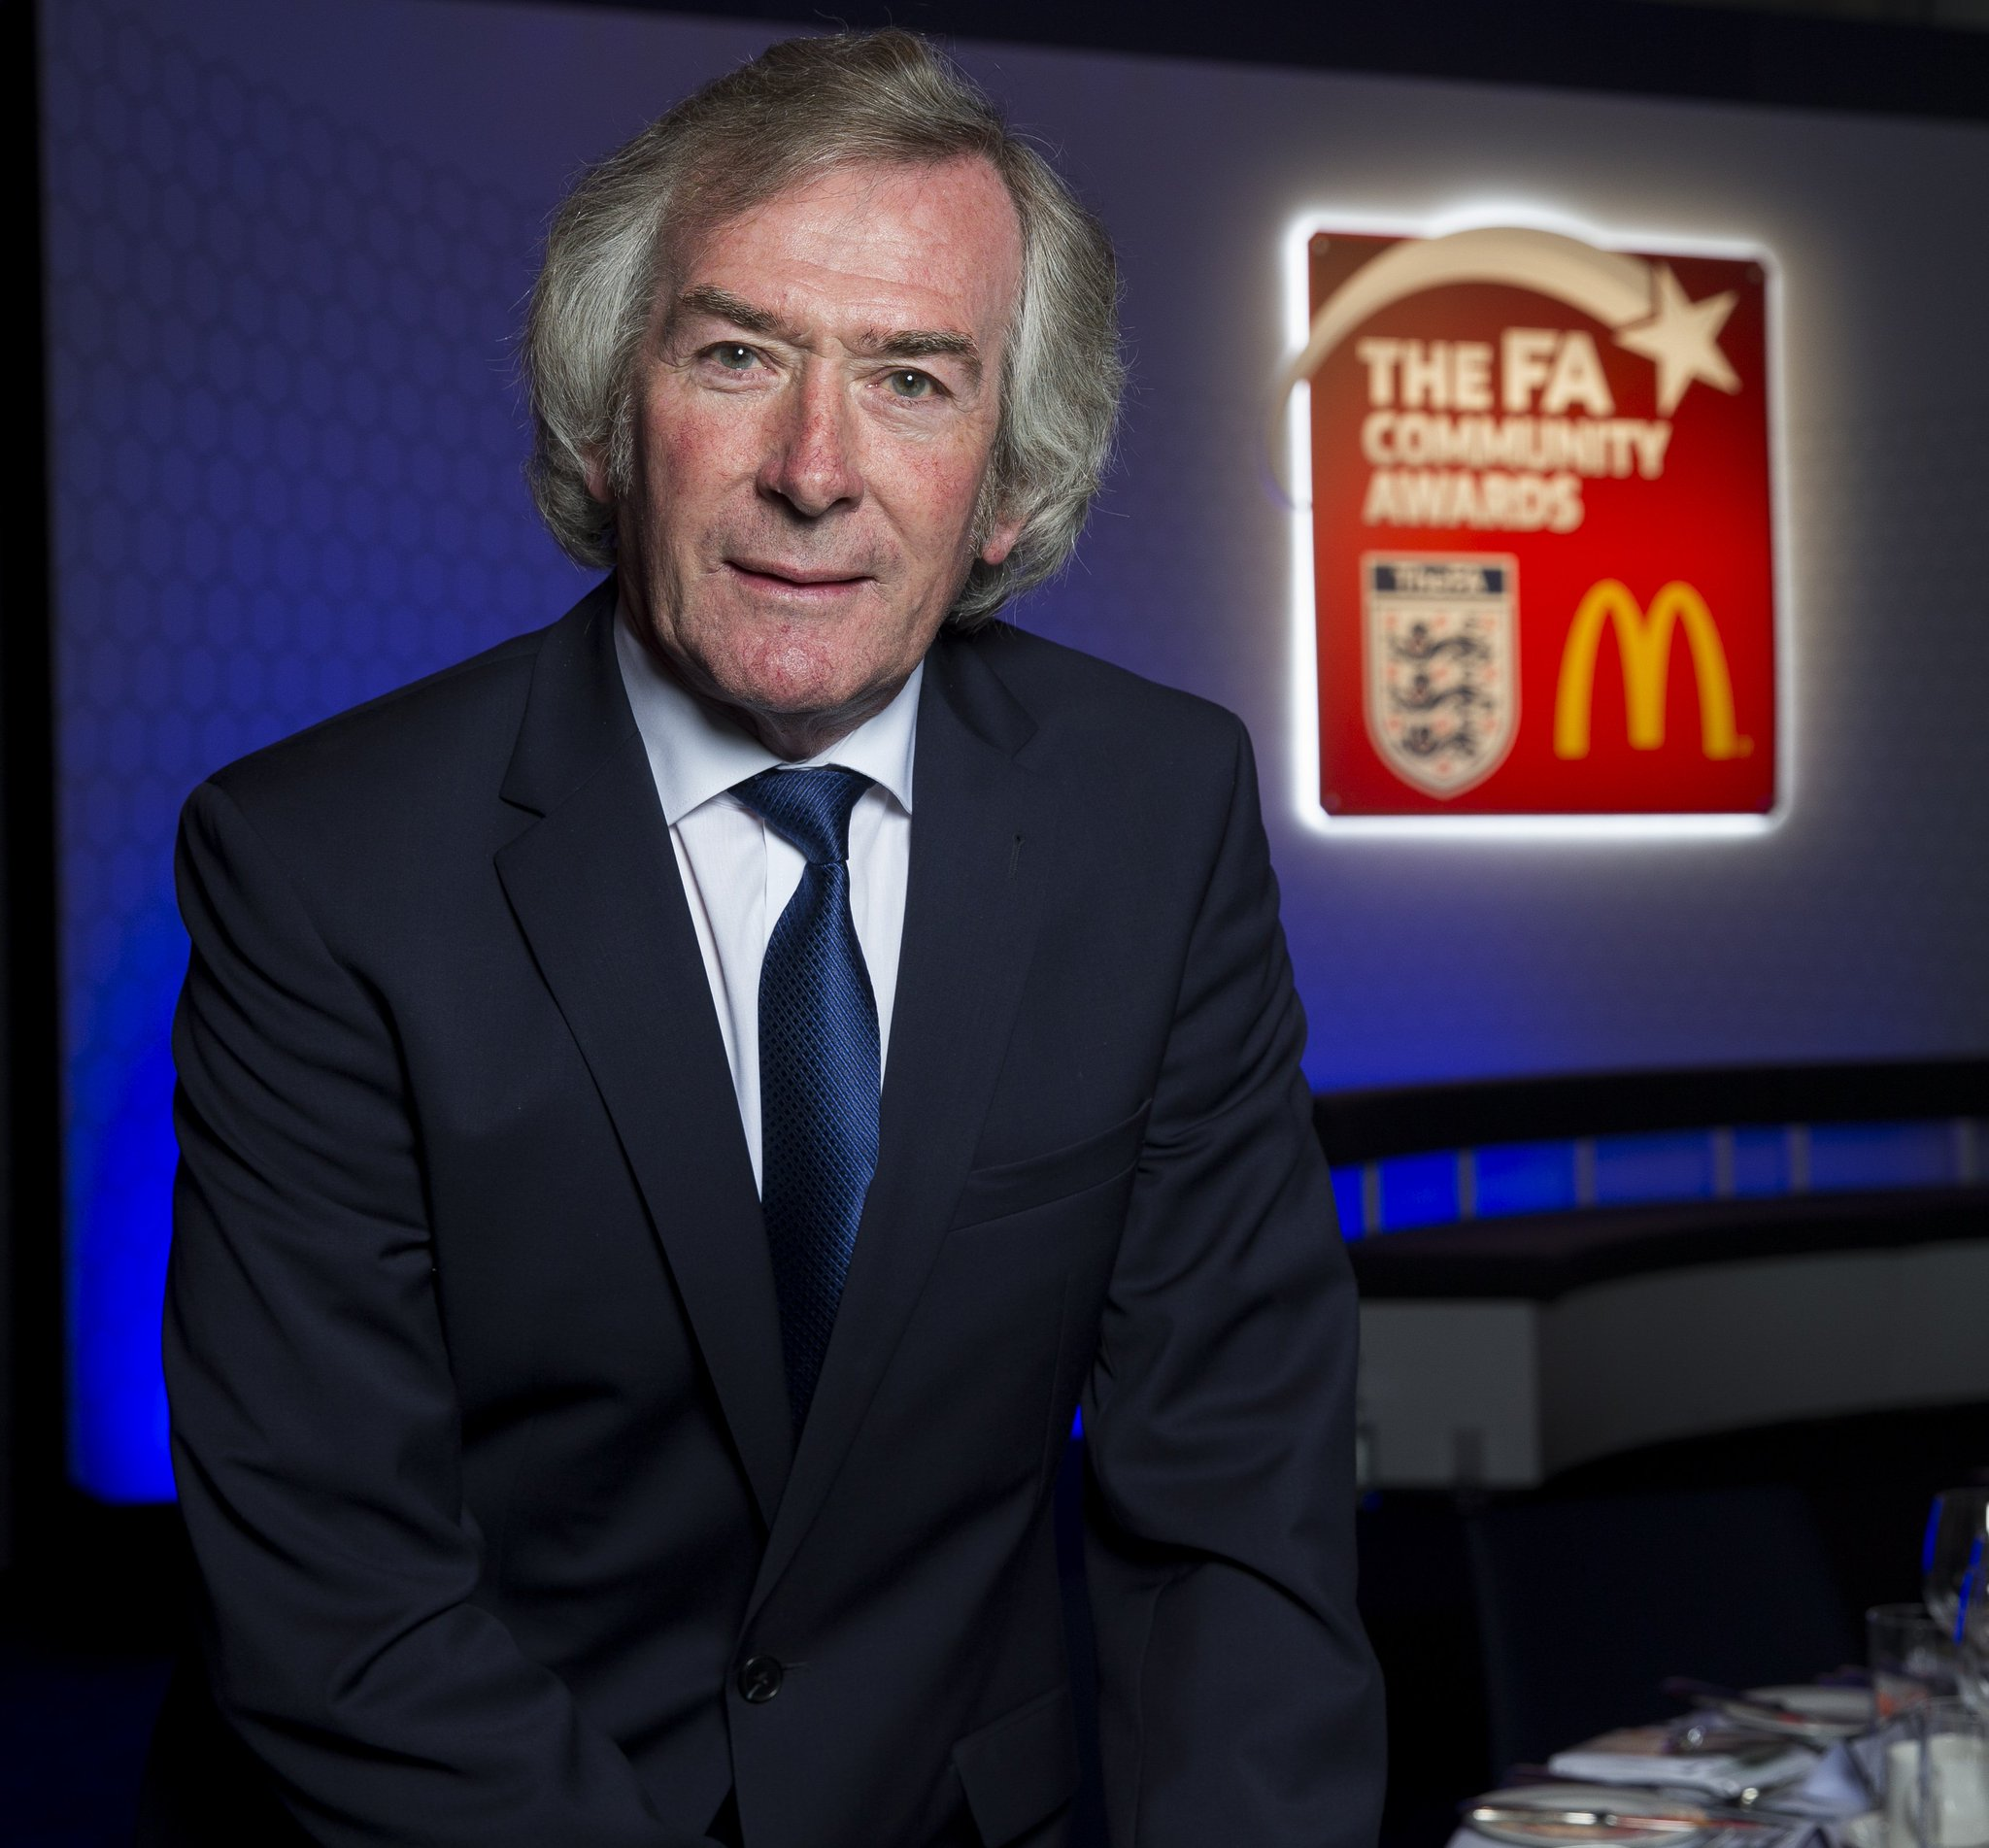 Happy Birthday to our Head of Northern Irish Football, Pat Jennings!